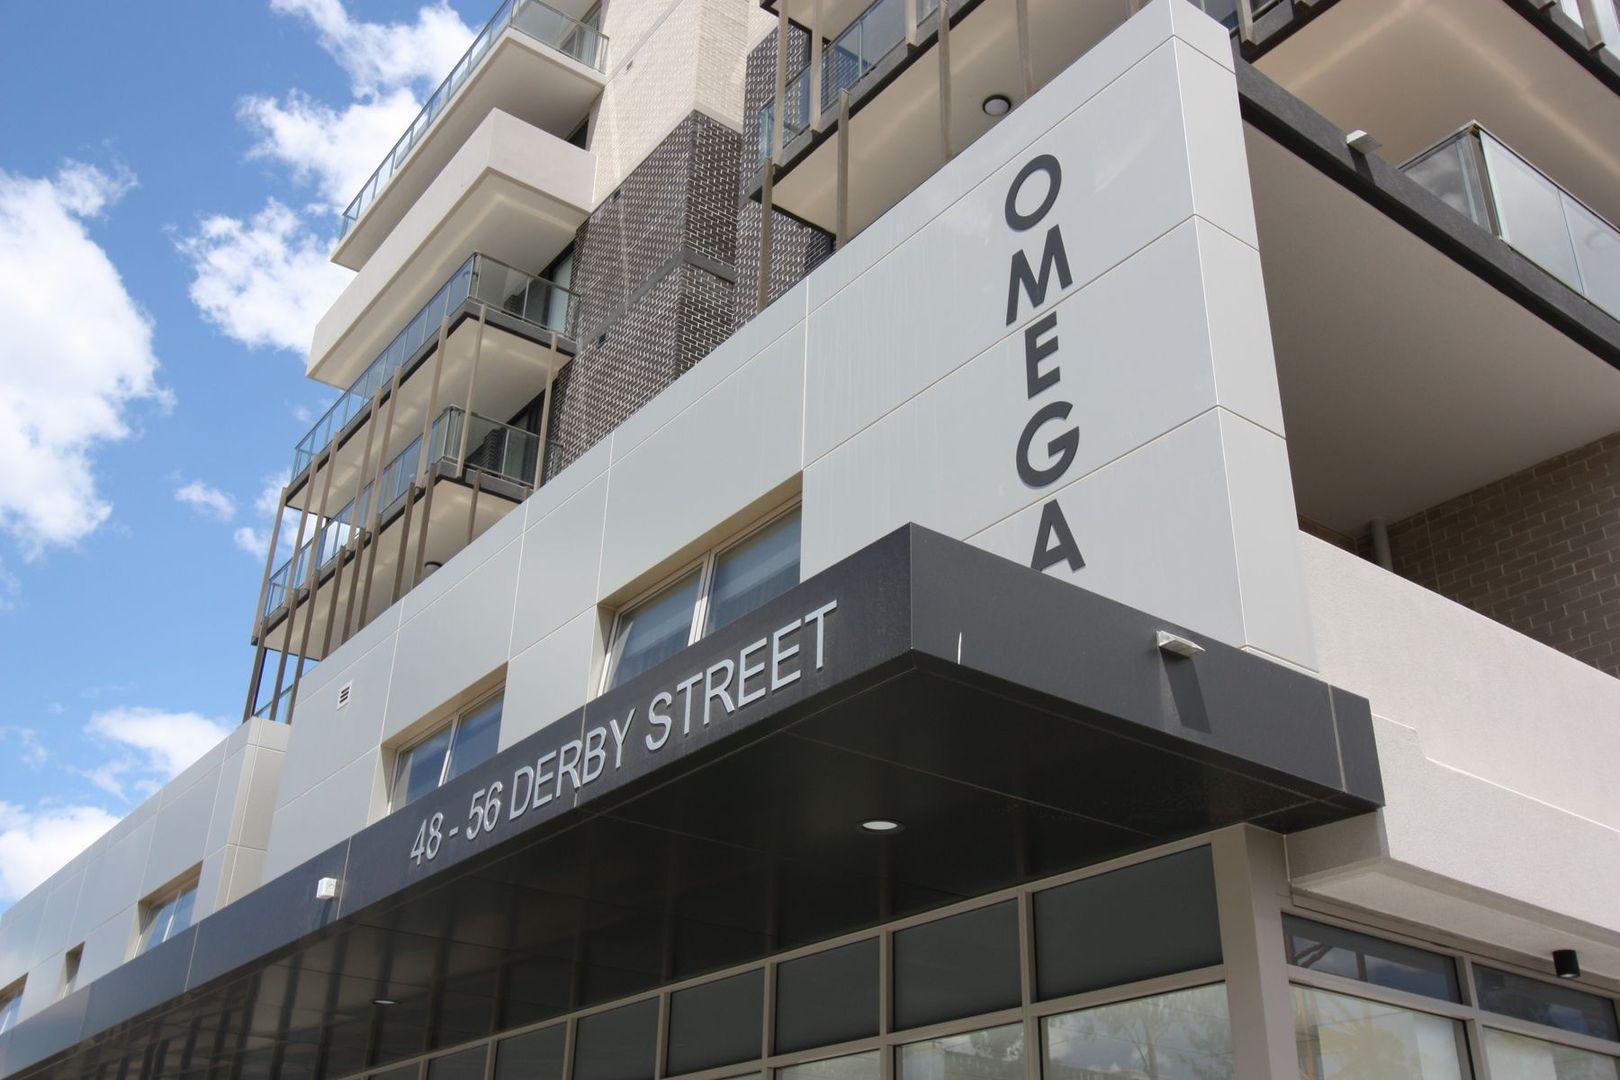 C104/48-56 Derby Street, Kingswood NSW 2747, Image 0